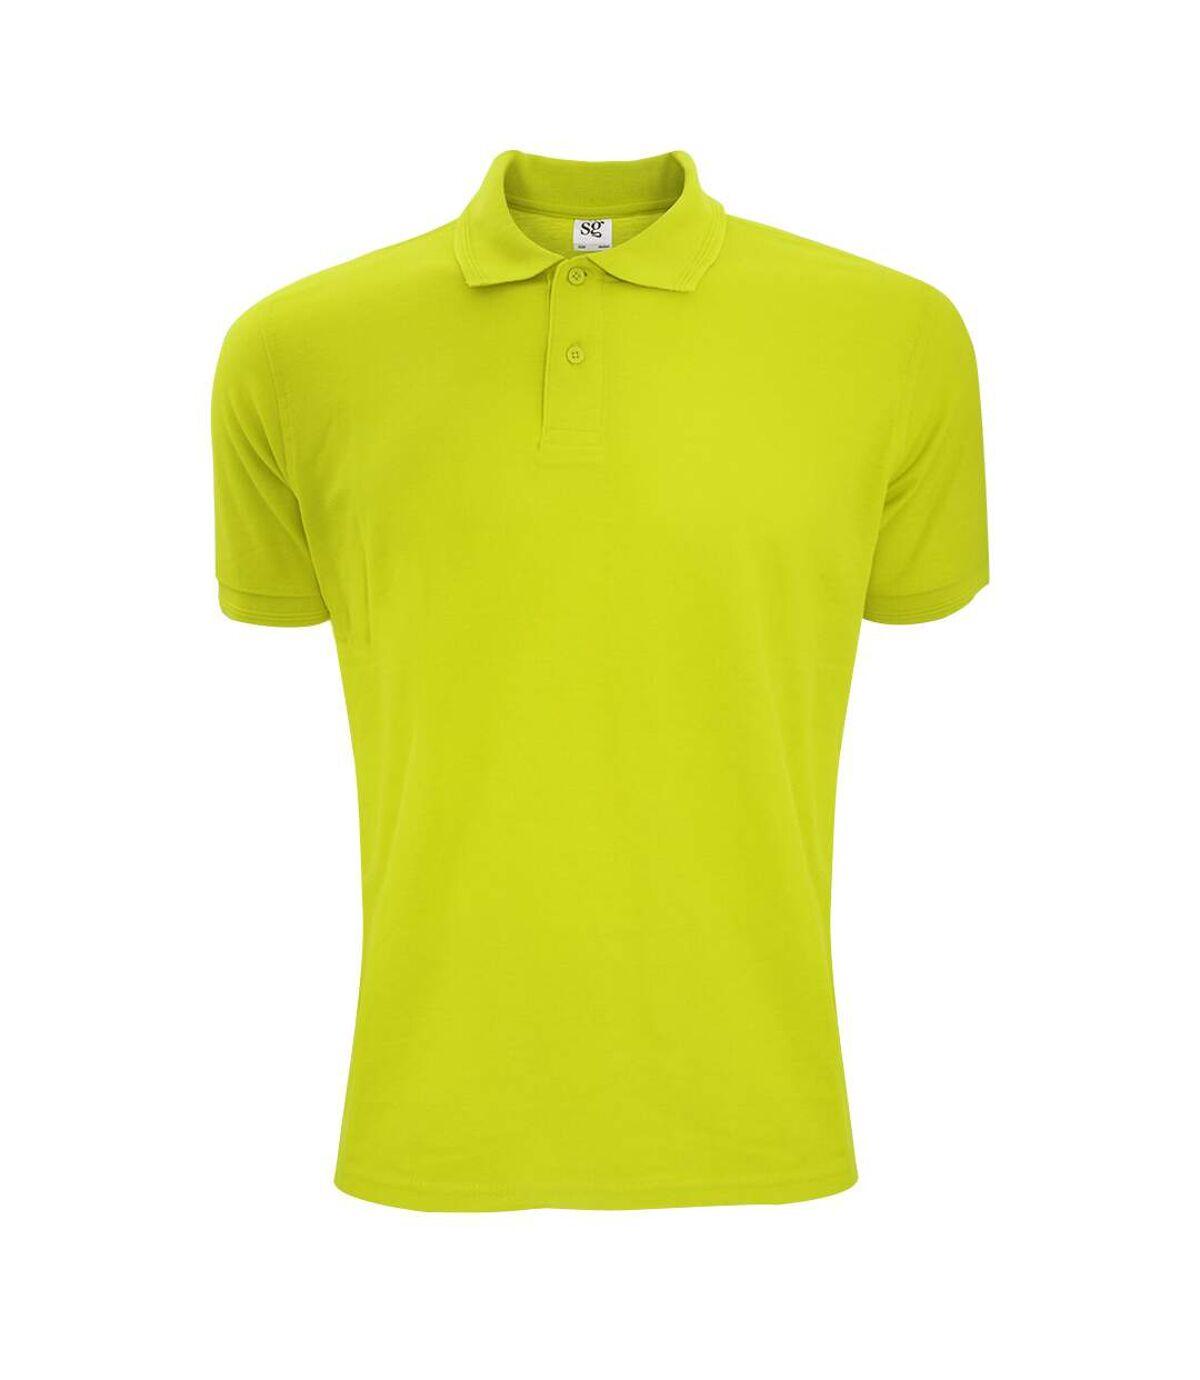 SG Mens Polycotton Short Sleeve Polo Shirt (Lime) - UTBC1084